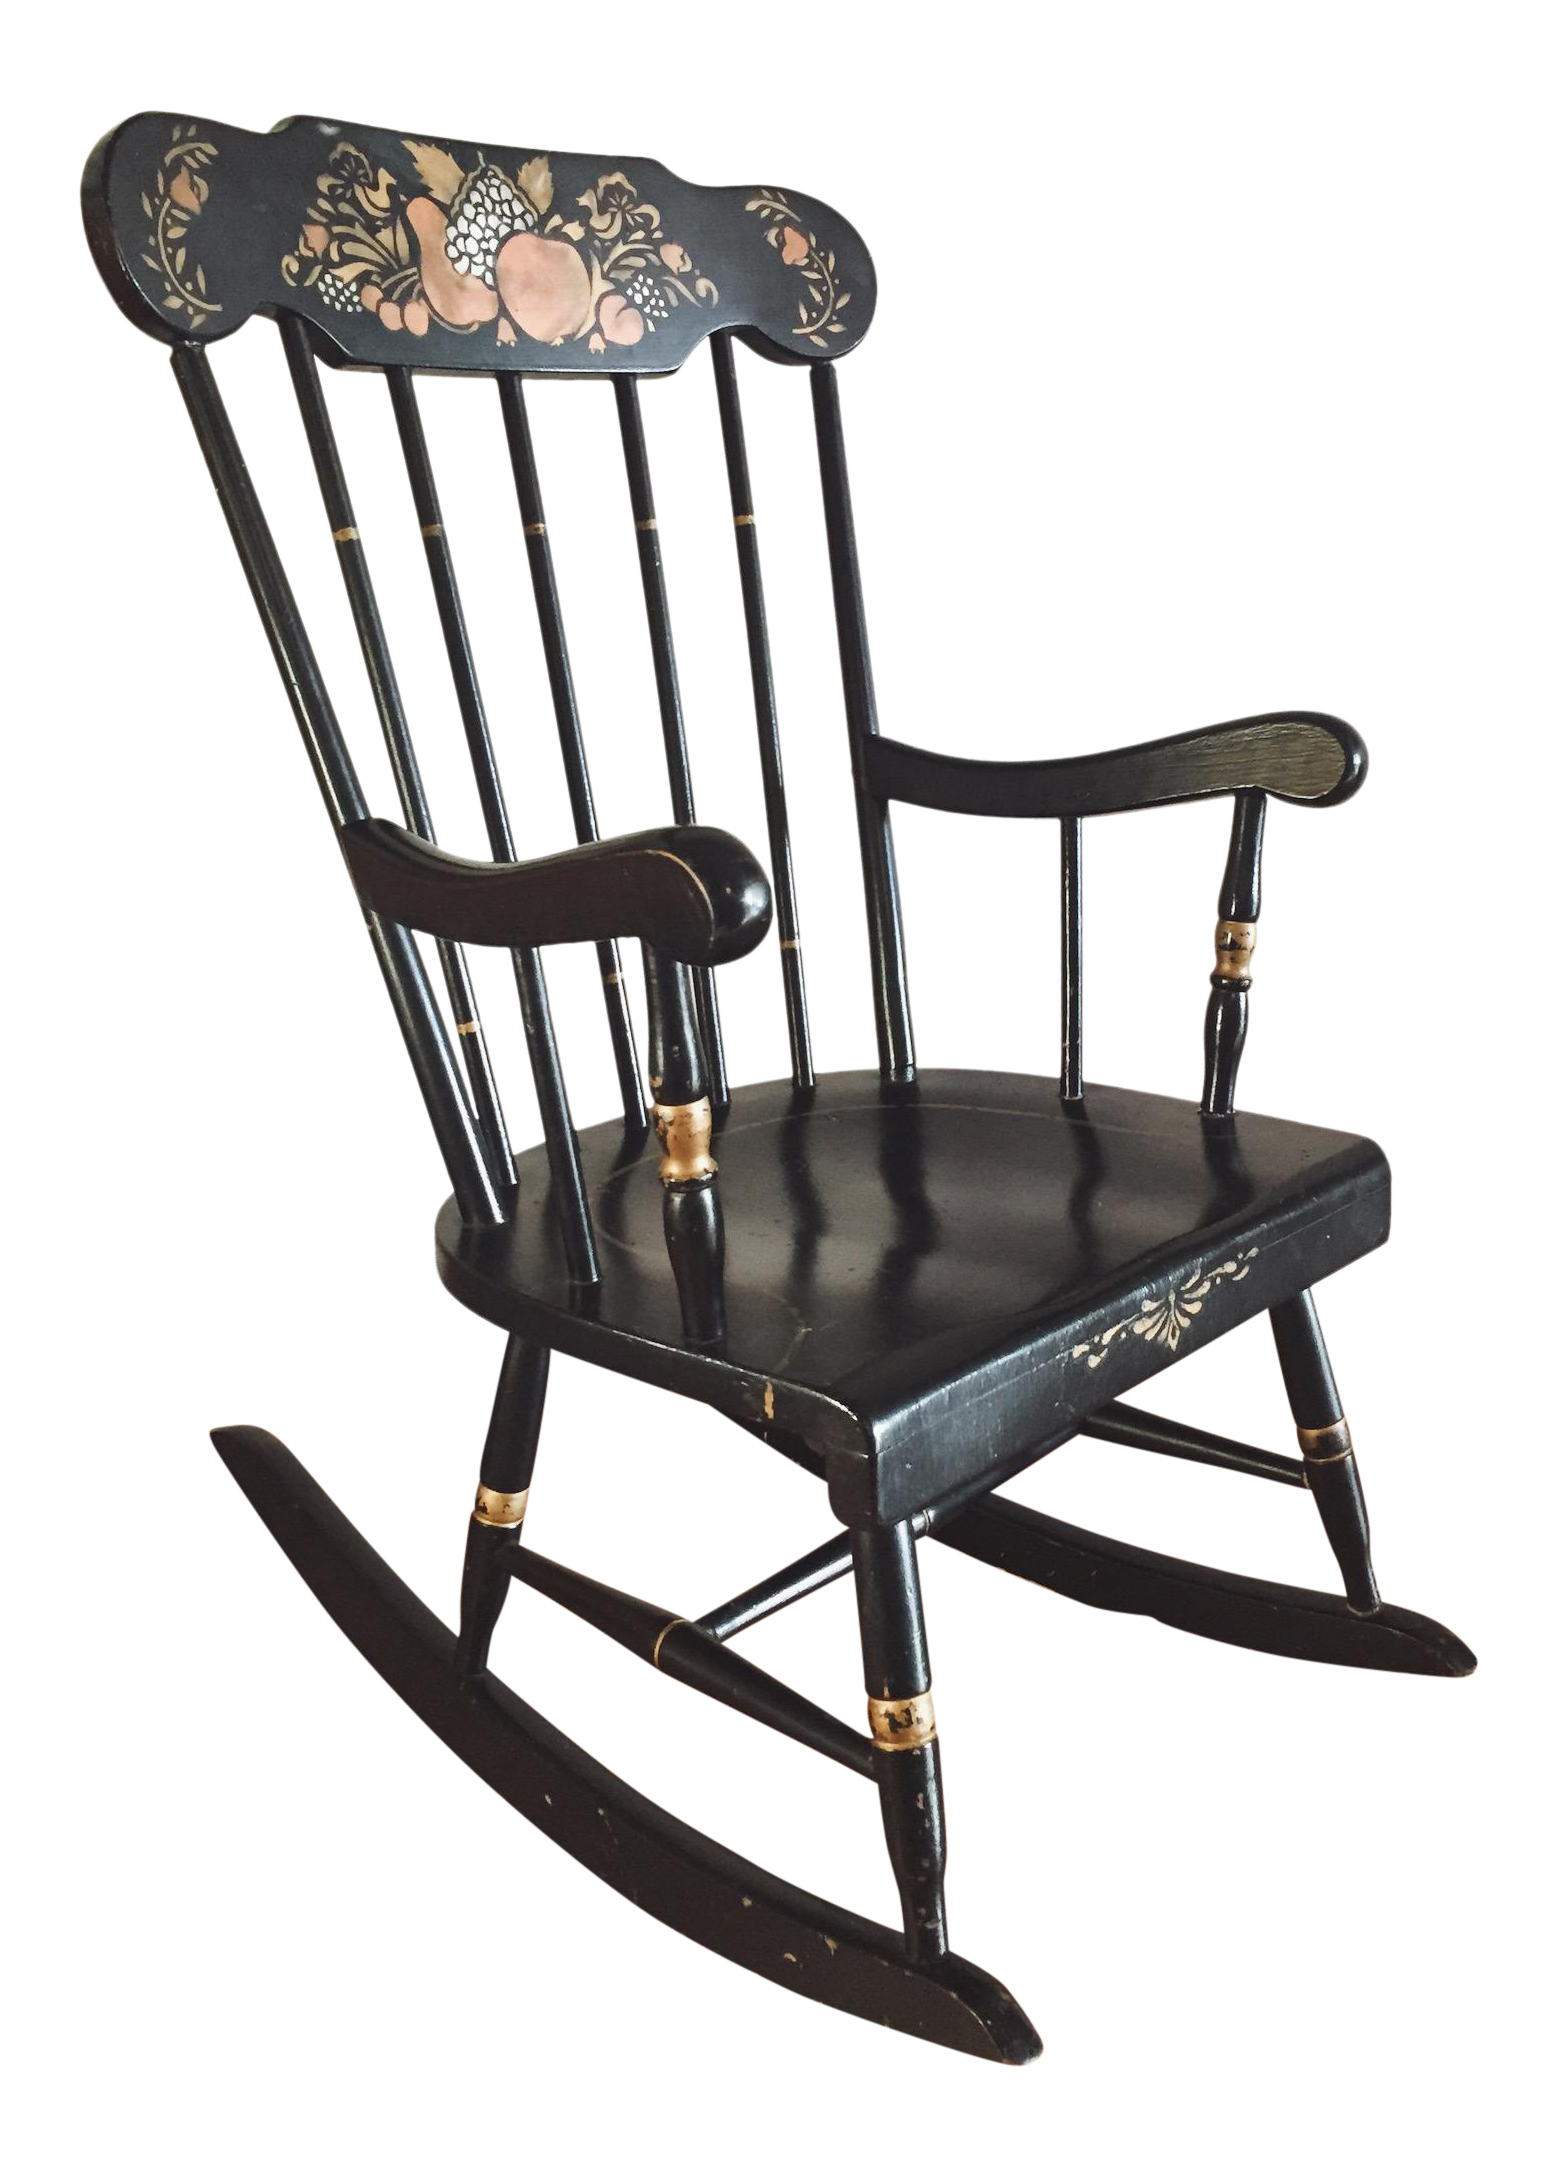 ebony-black-rocking-chair-virgin-mobil-broad-band-to-go